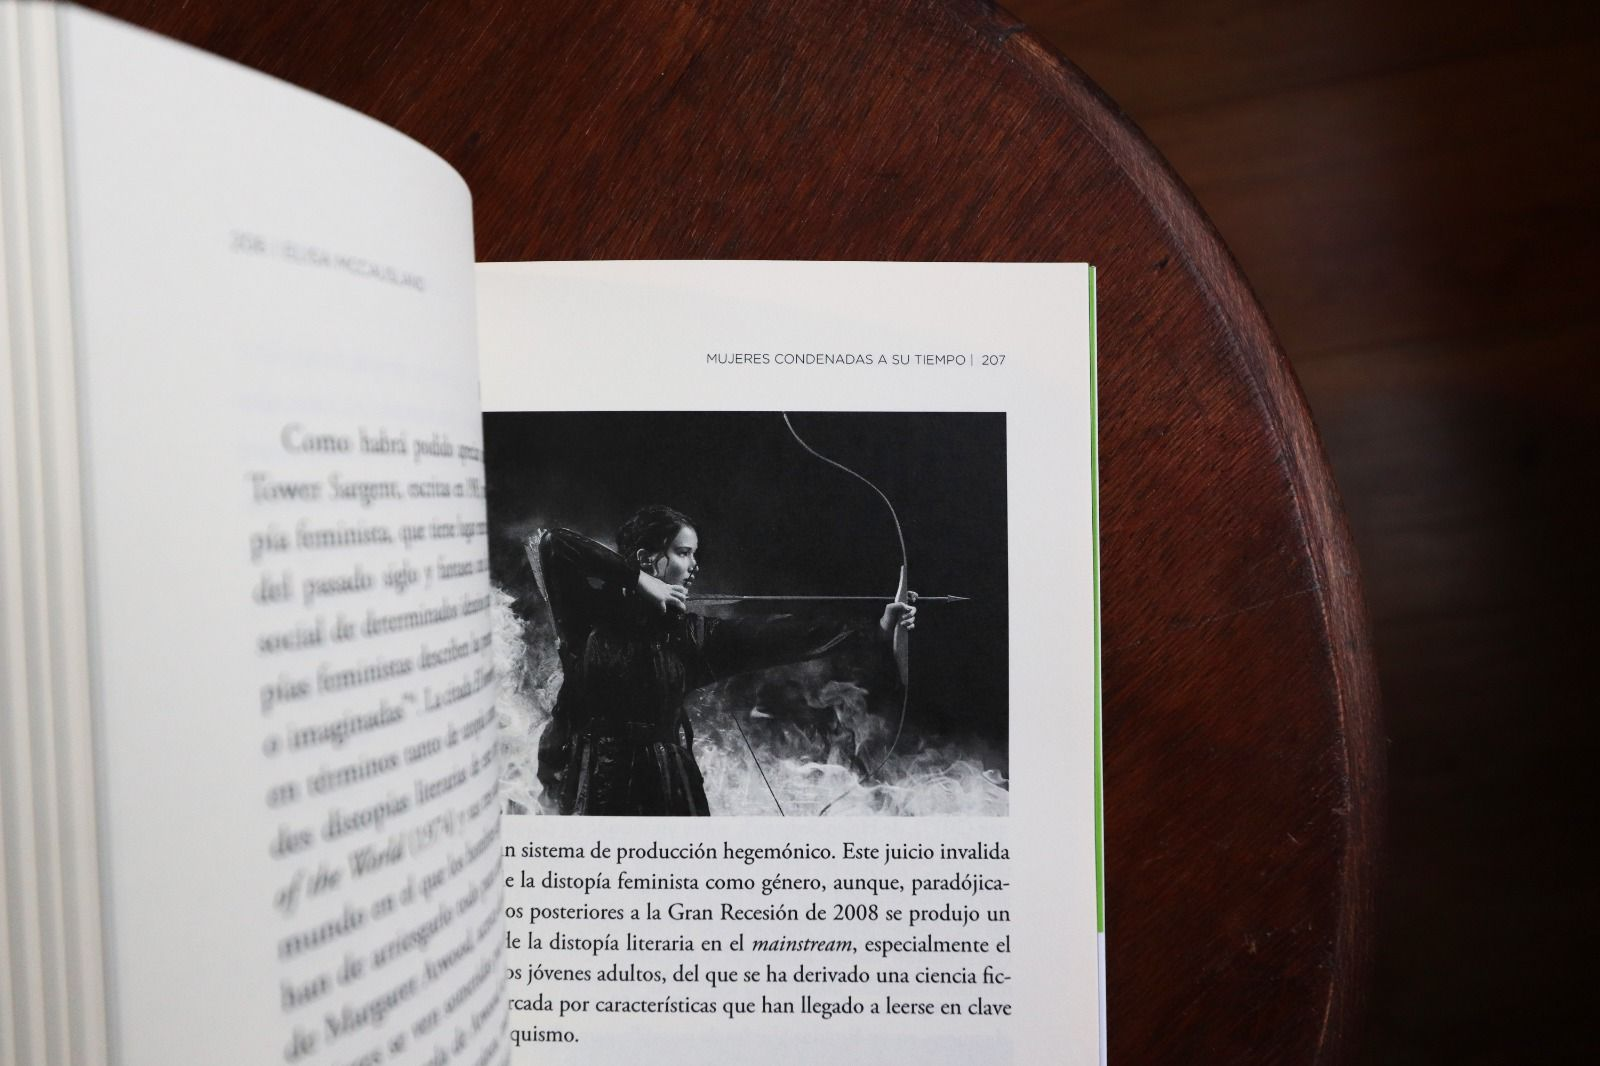 Imaginar Mundos – Sans Soleil Ediciones 2019-05-14 at 19.45.44 (12)